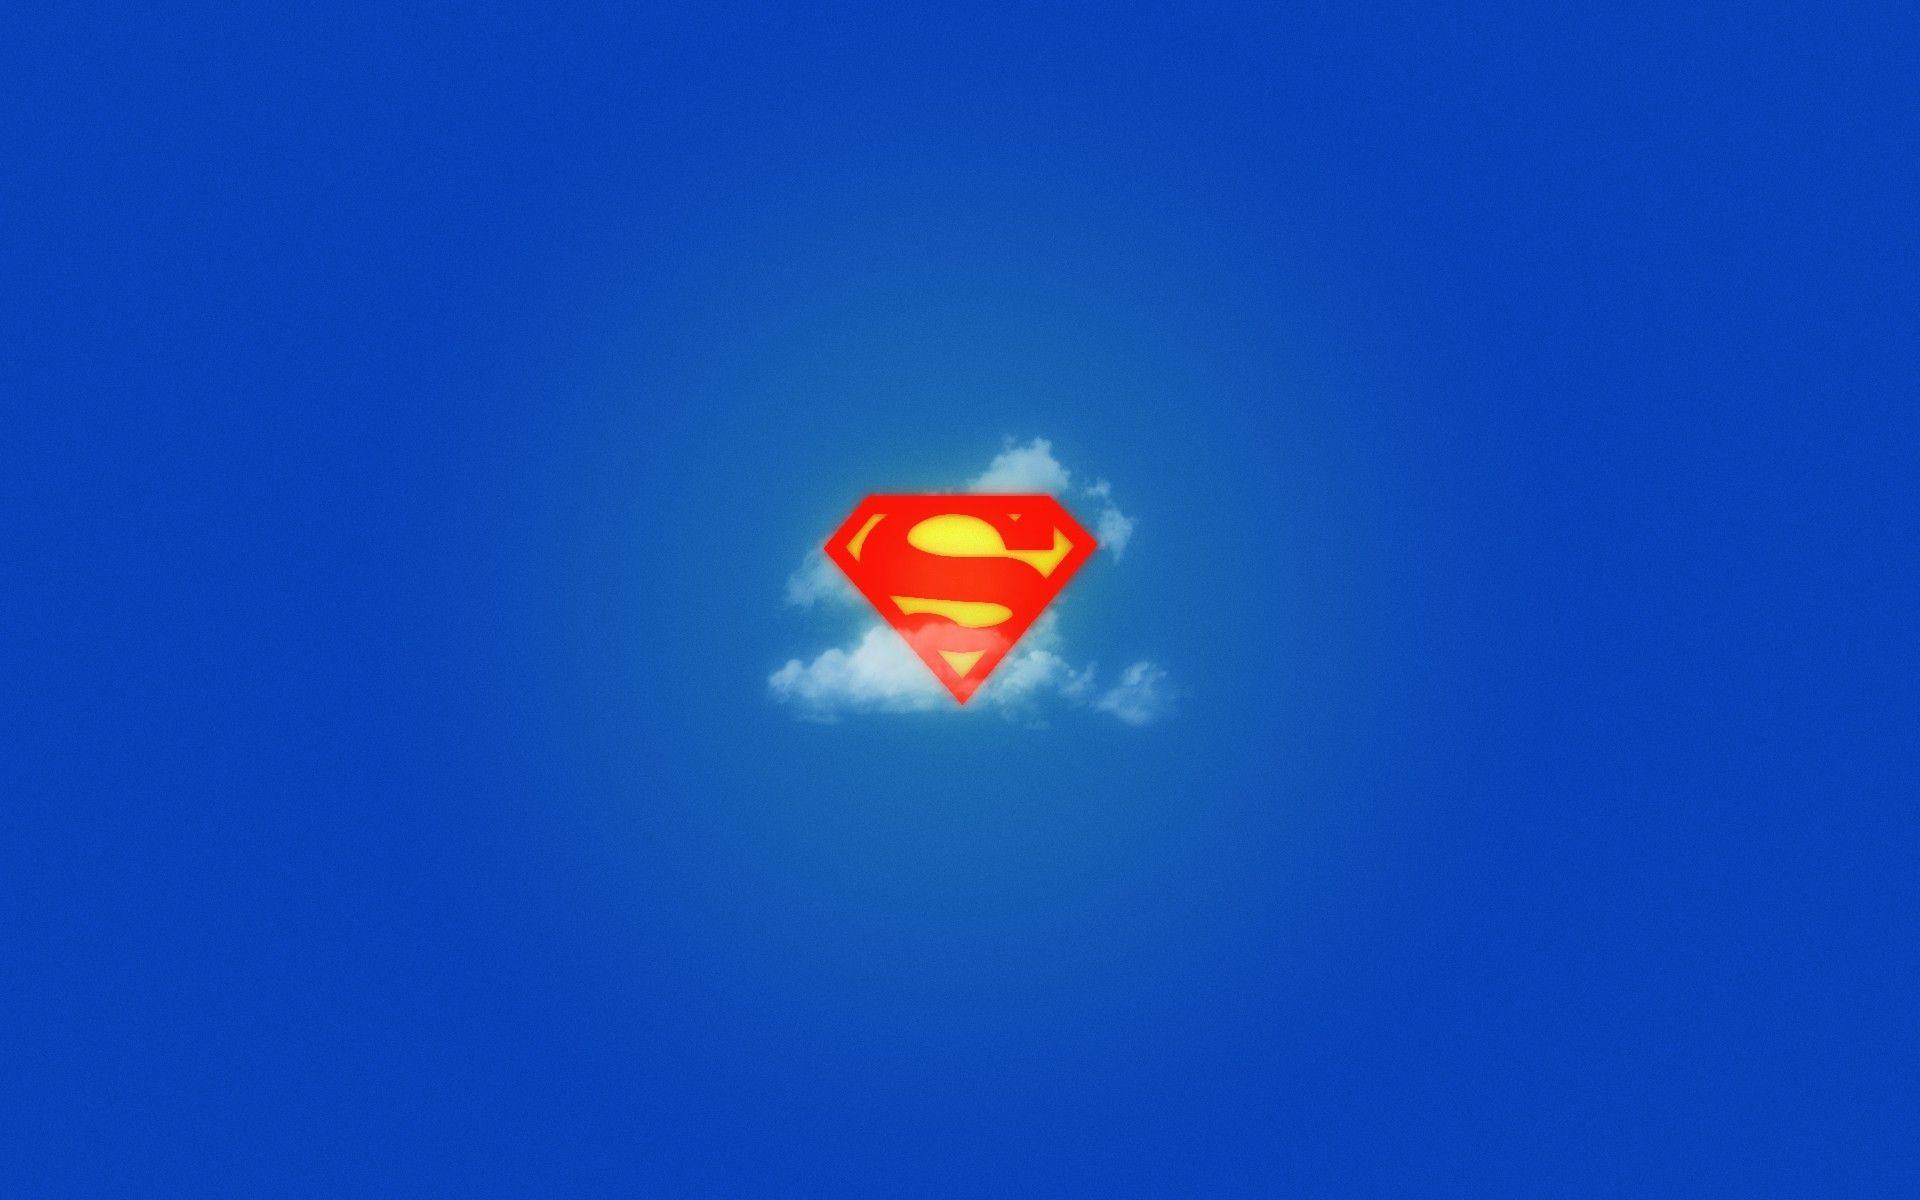 best ideas about superman hd wallpaper on pinterest superman 1920a—1080 superman image wallpapers